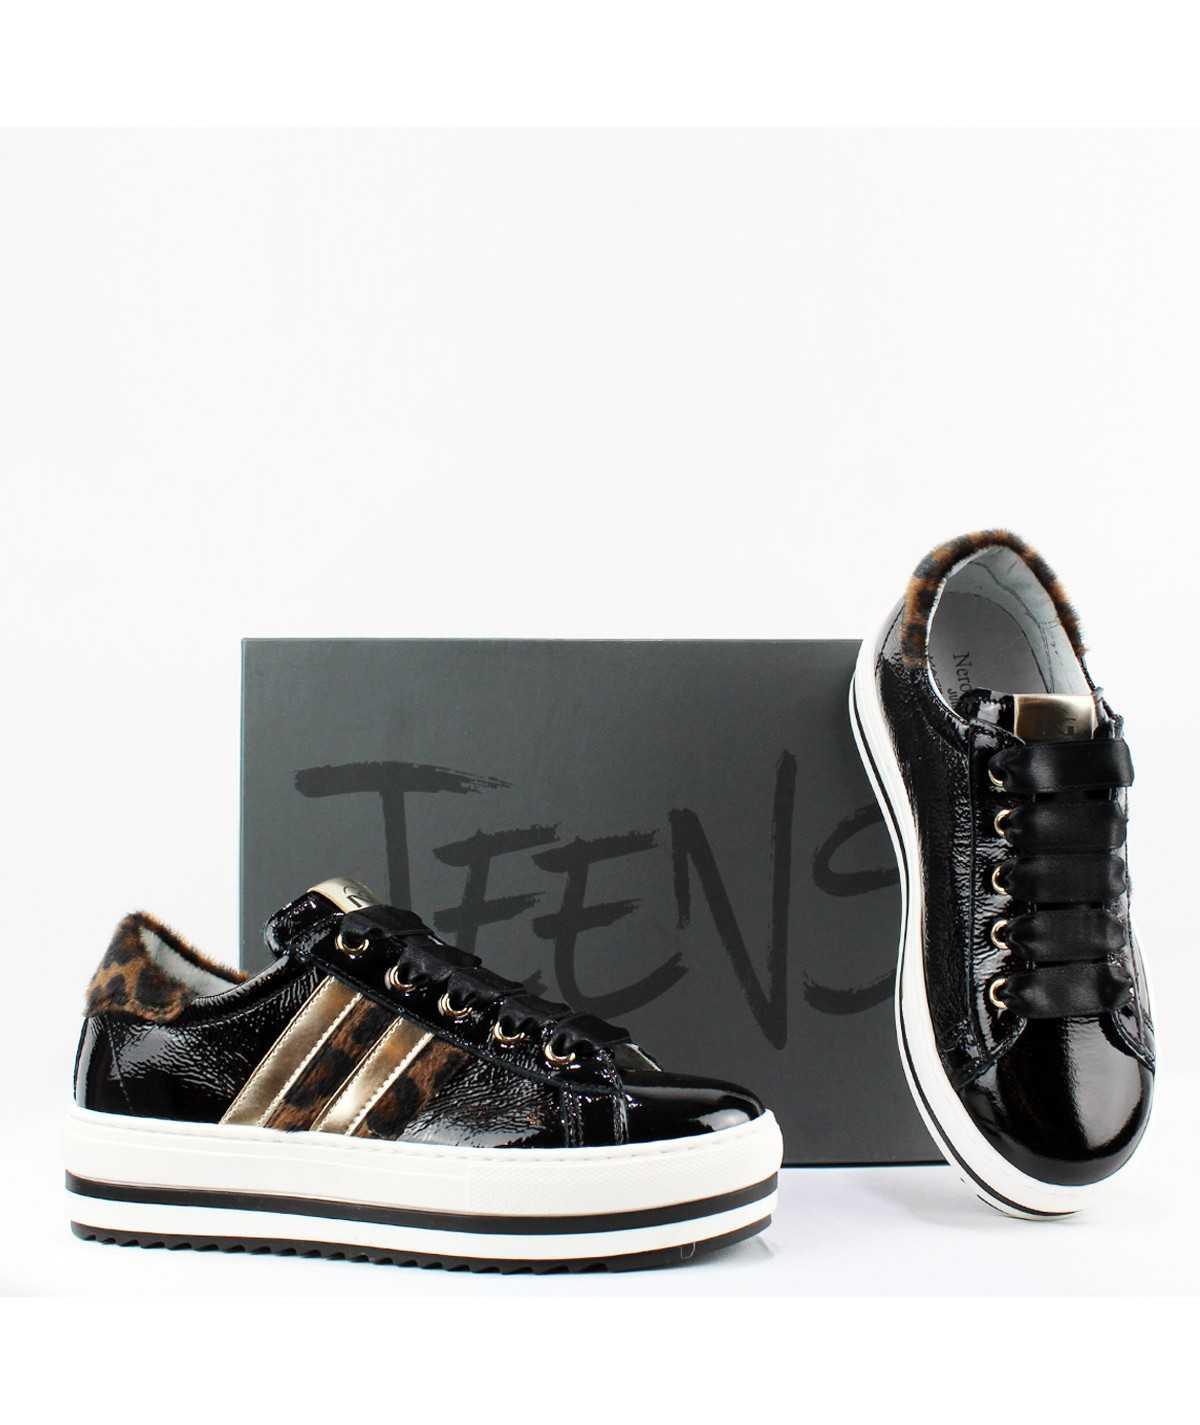 NEROGIARDINI Sneakers 31/34